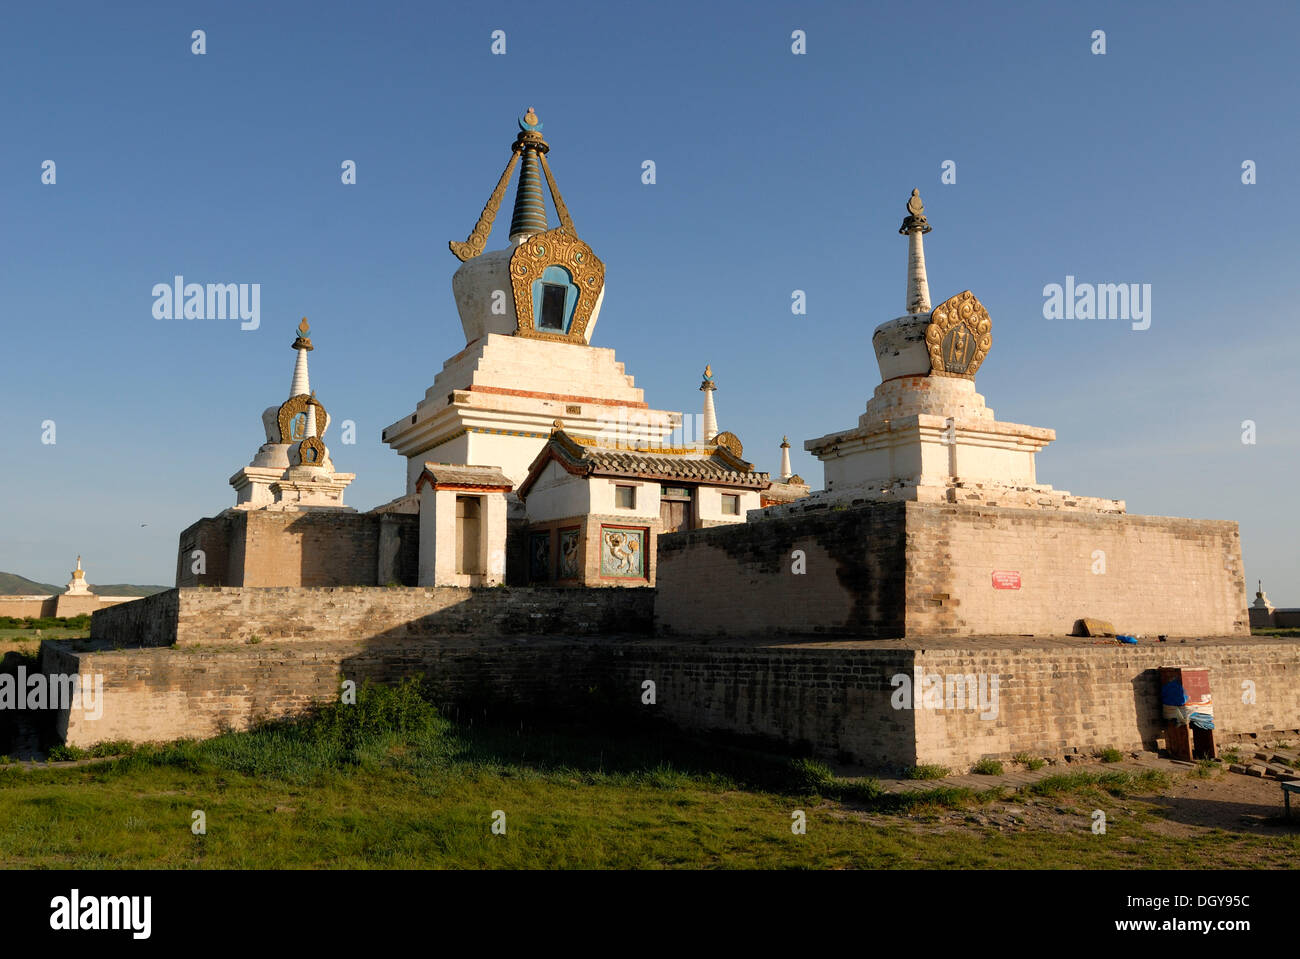 Stupa and temples in the inner complex of Erdene Zuu Khiid Monastery, Karakorum, Kharkhorin, Oevoerkhangai Aimak, Mongolia, Asia - Stock Image